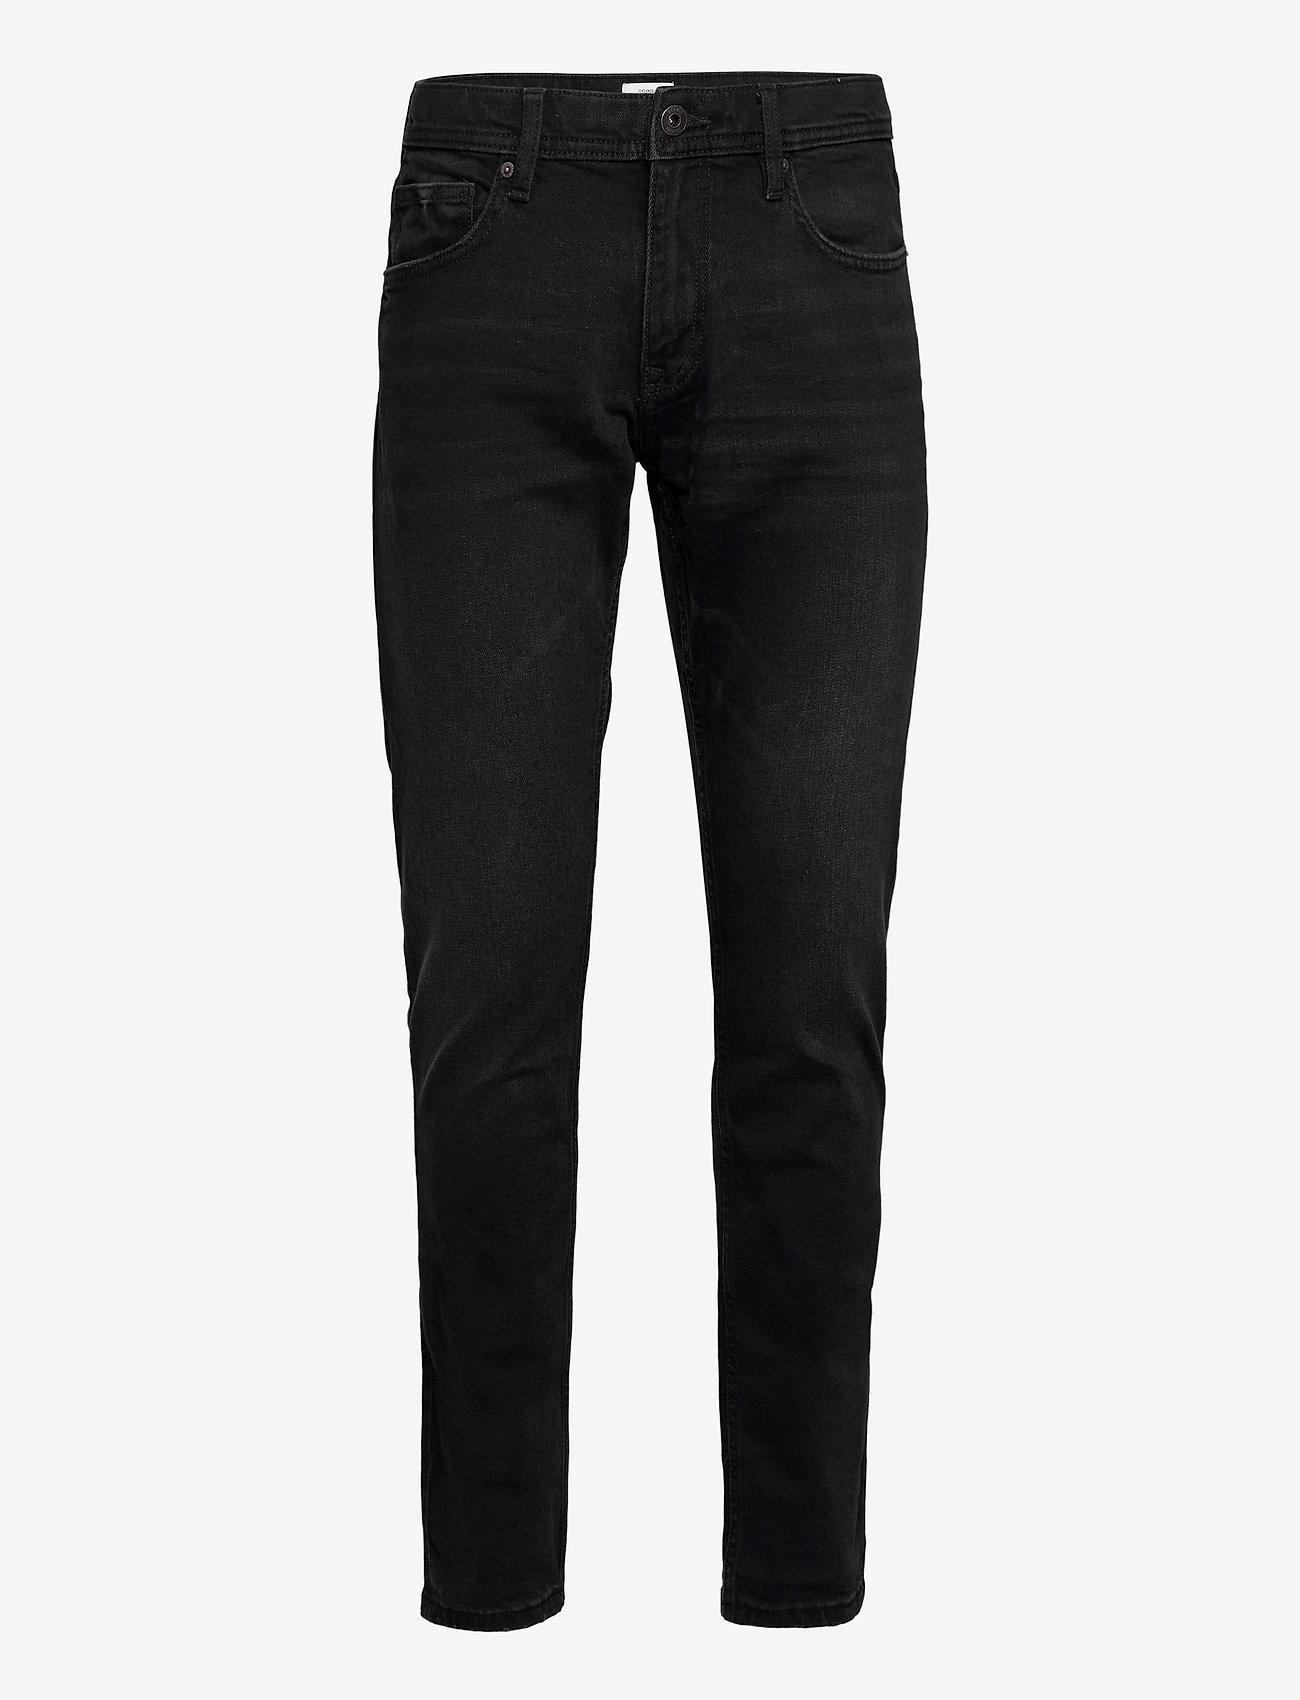 Esprit Casual - Pants denim - slim jeans - black dark wash - 0